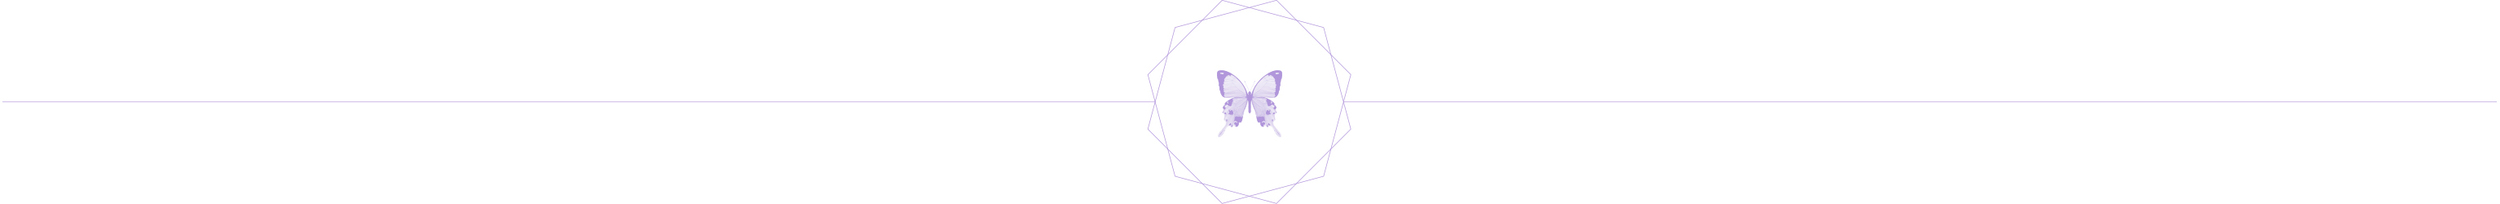 LS_1.jpg